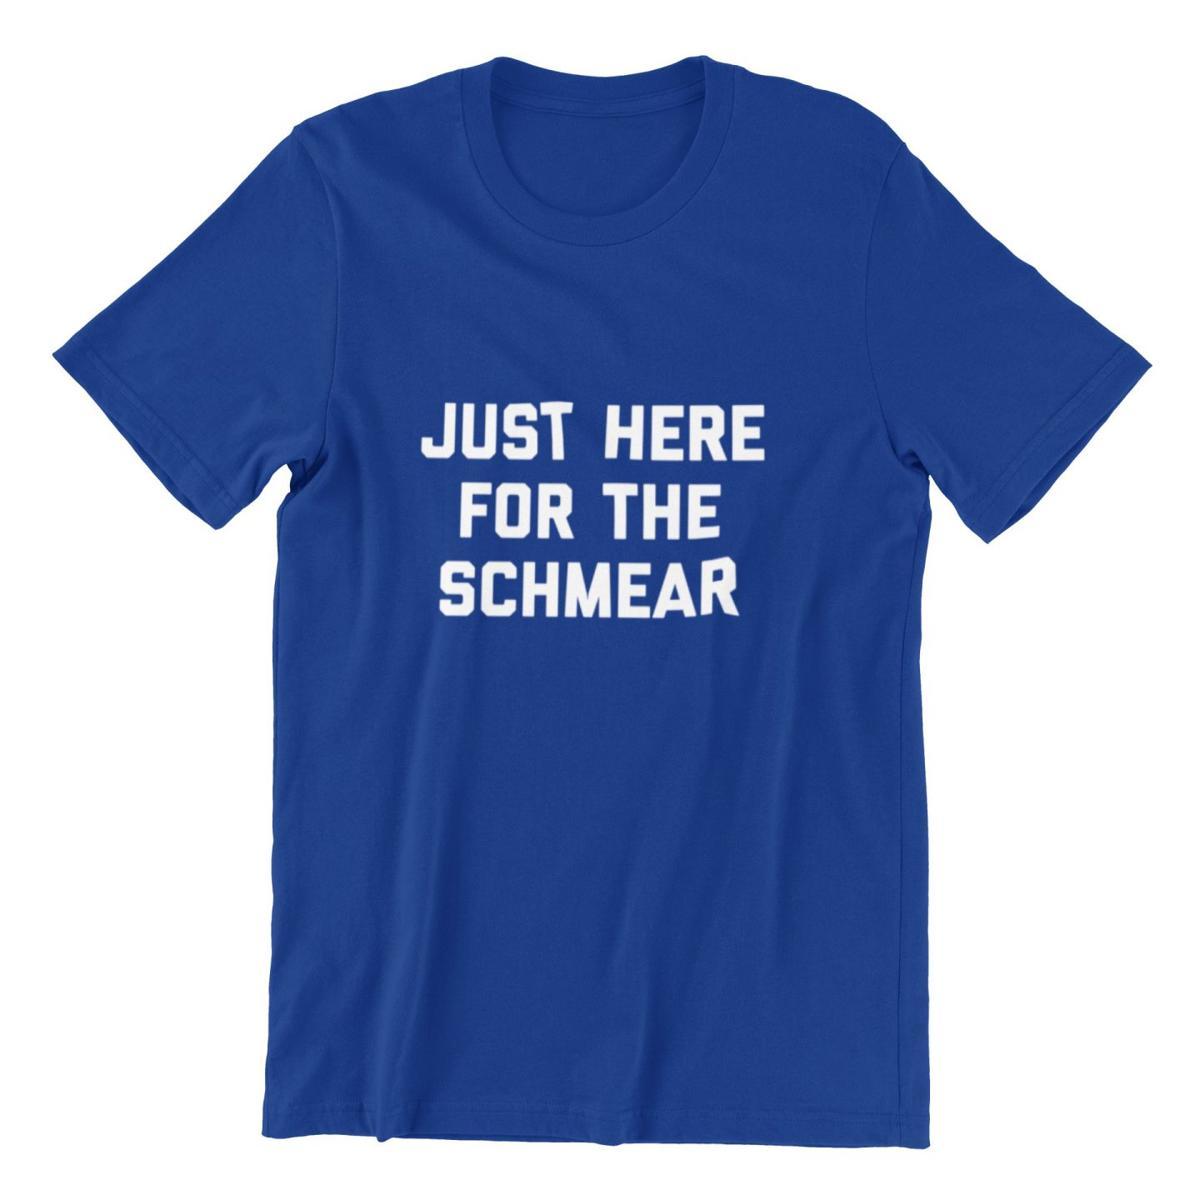 Schmear shirt Schmattees.jpg